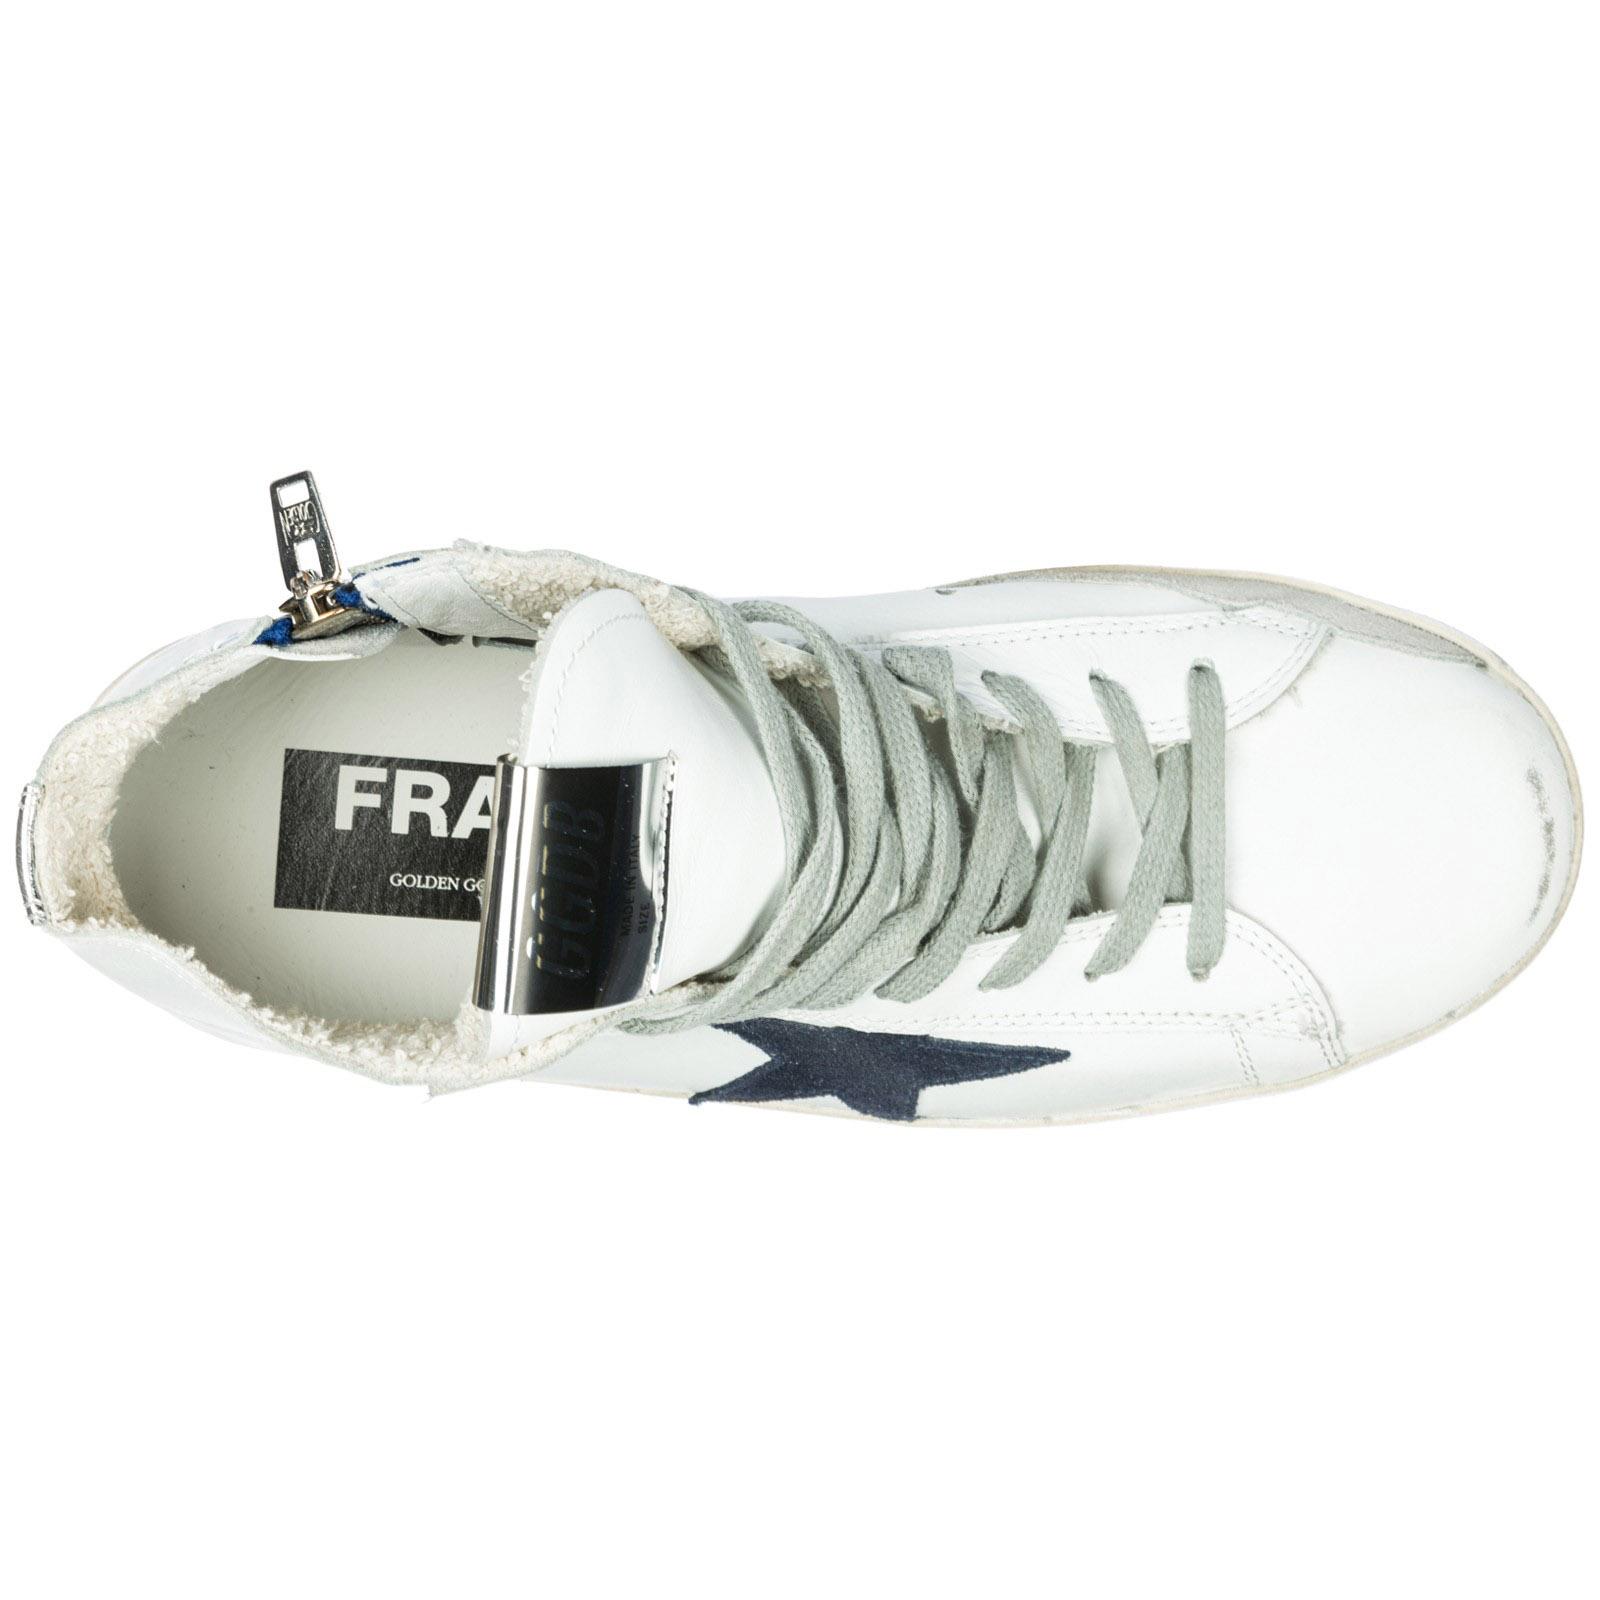 Sneakers alte Golden Goose Francy G33WS591.B39 white - bluette ... 1e33d39085e